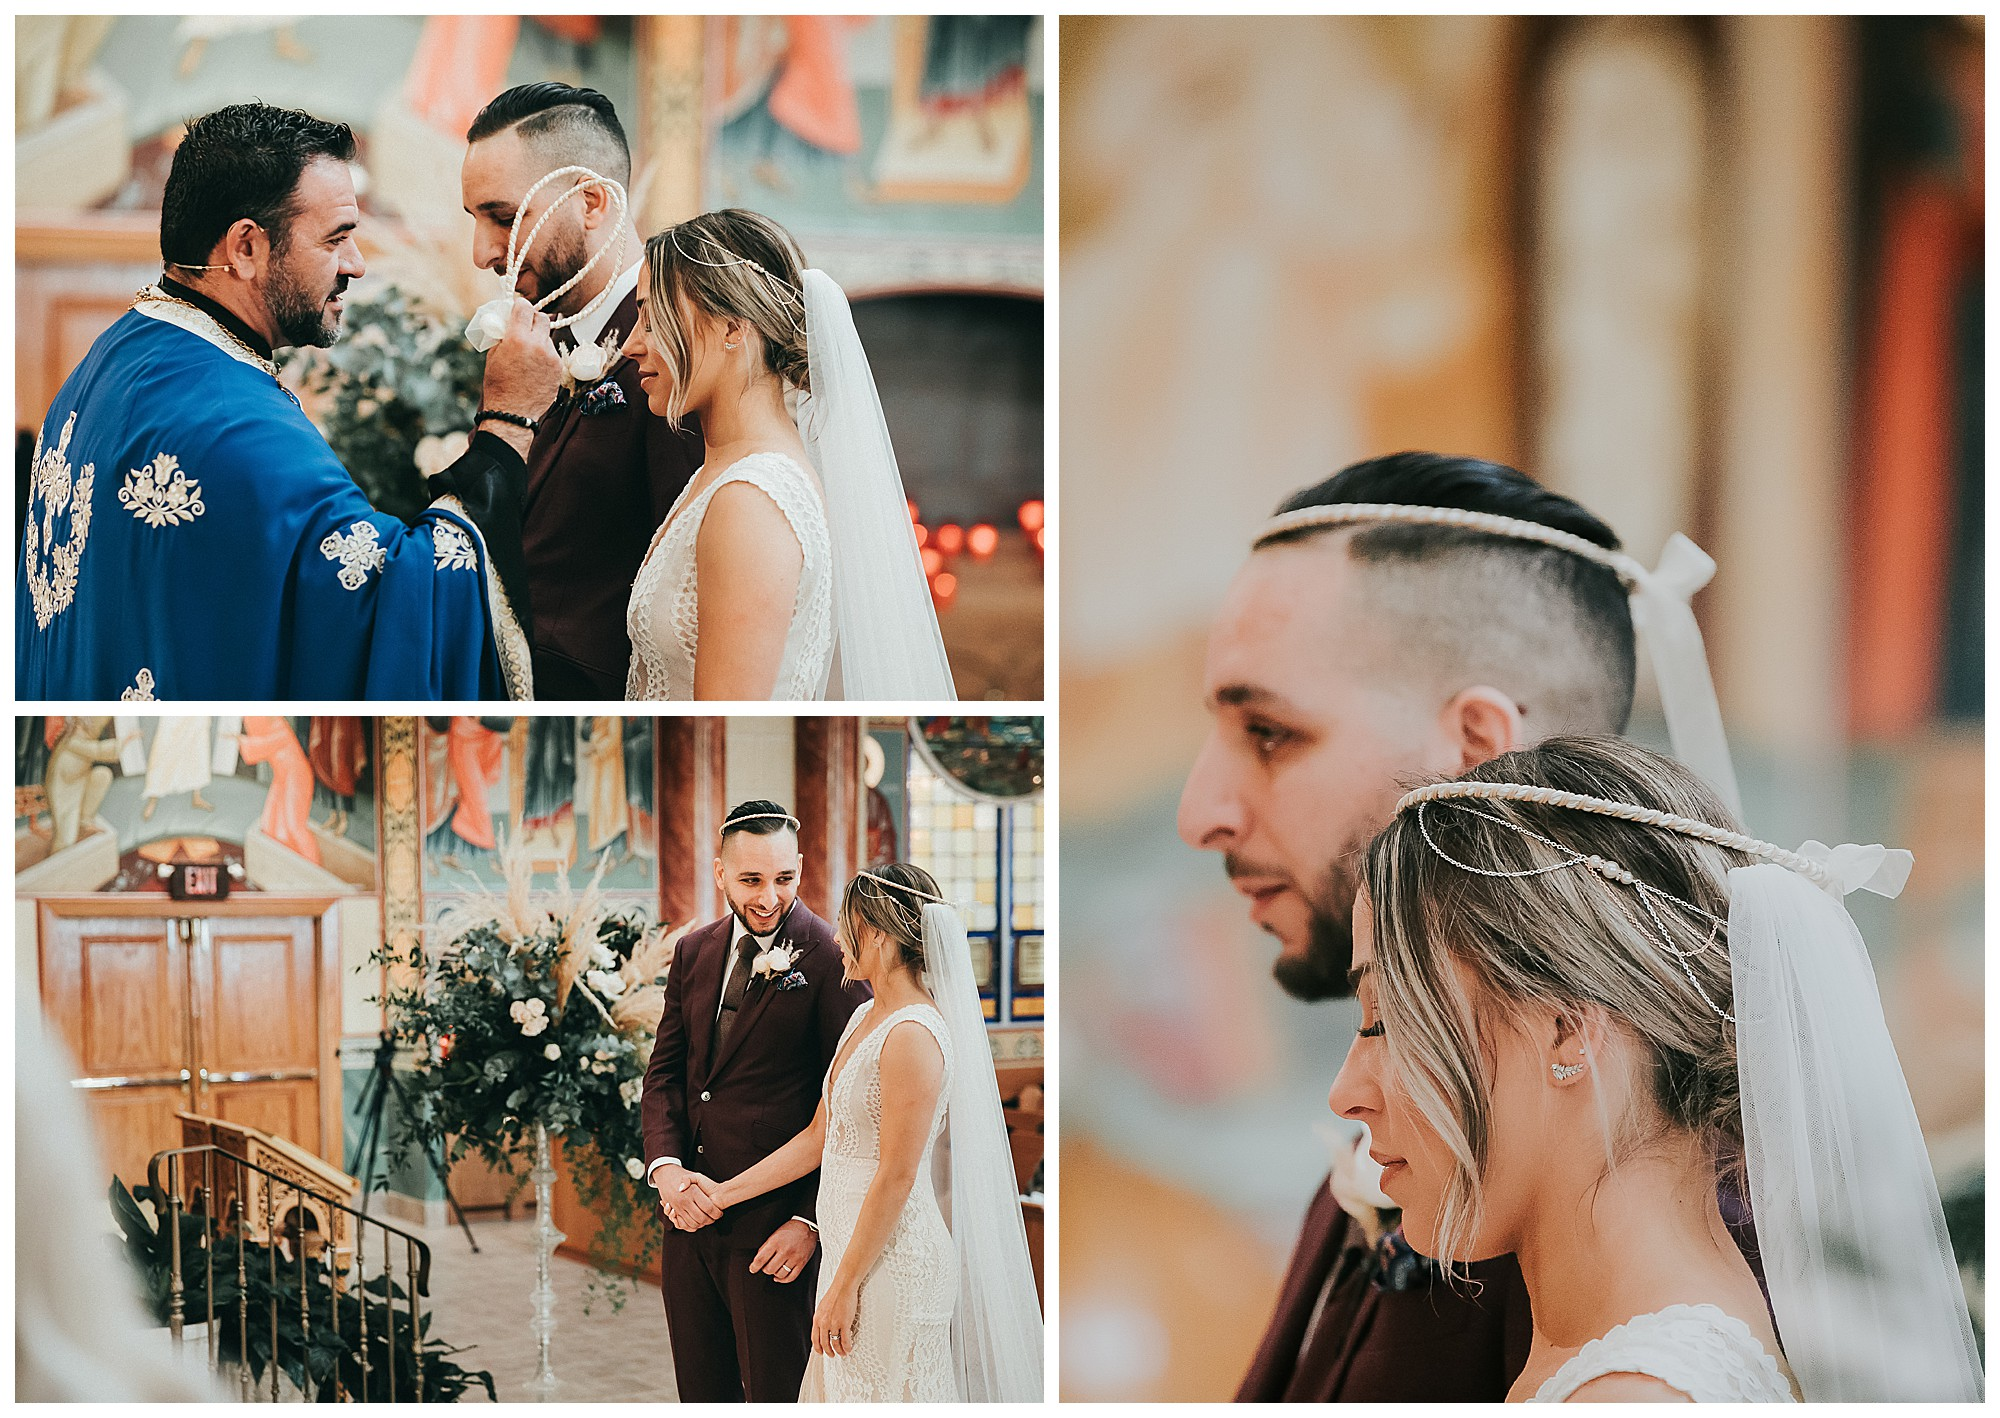 Joanna-Christos-Grand-Luxe-Wedding-Photos-Mint-Room-Toronto-VanDaele-Russell_0074.jpg